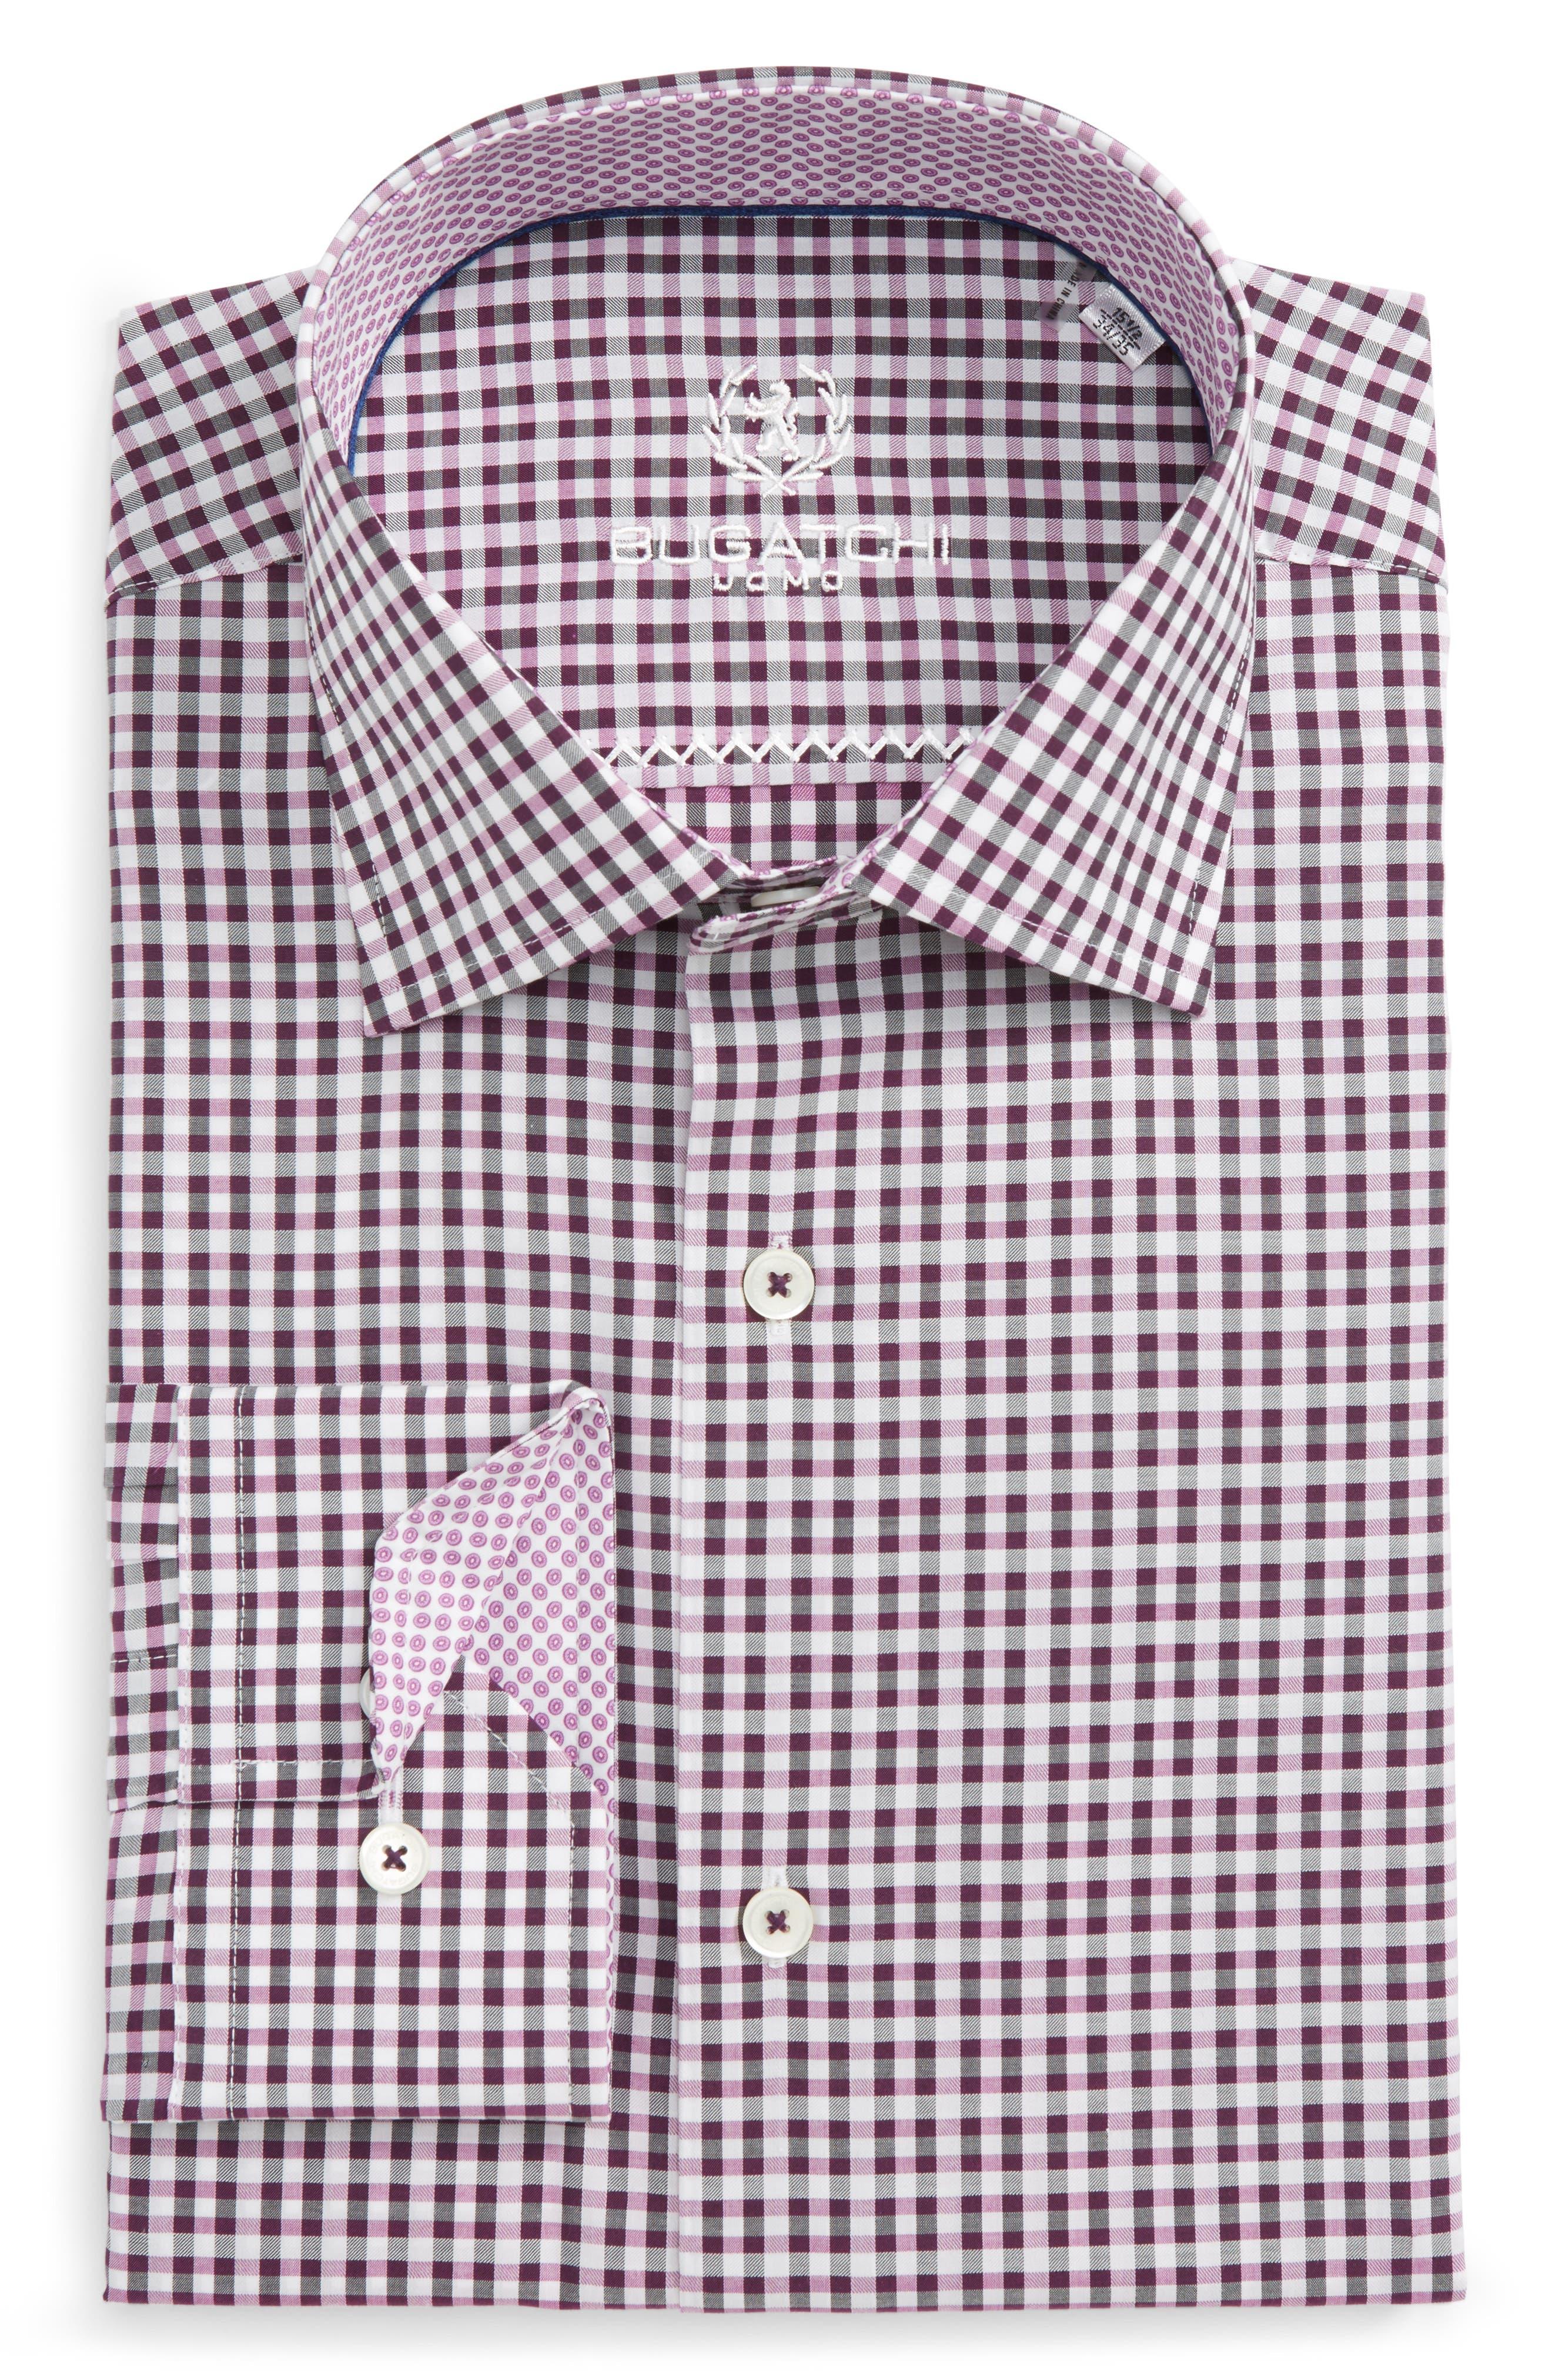 Trim Fit Check Dress Shirt,                             Main thumbnail 1, color,                             503